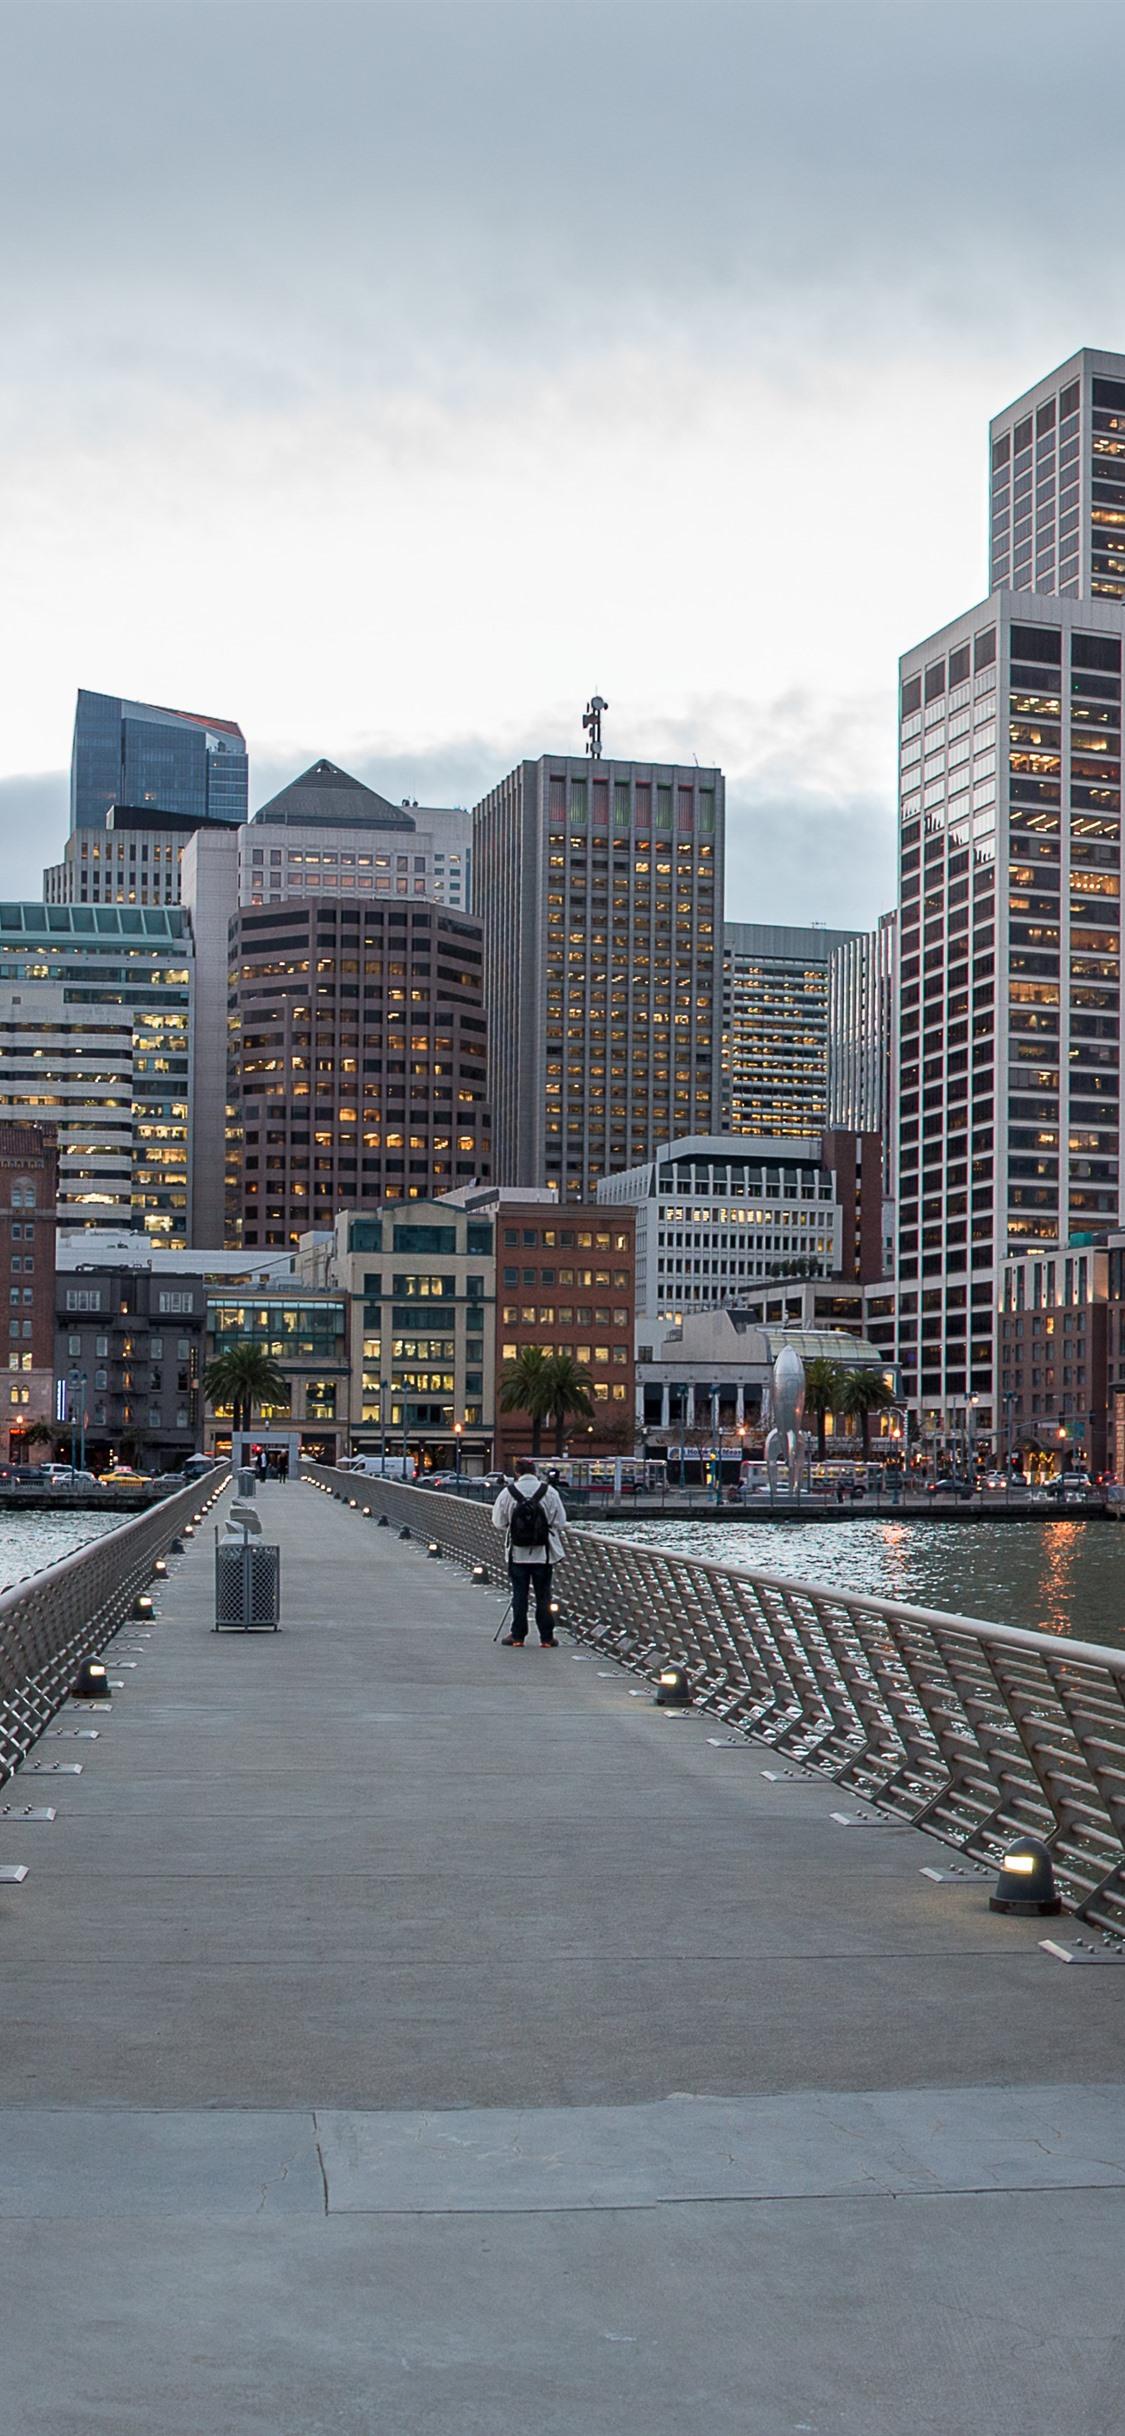 San francisco california usa skyscrapers bridge sea - San francisco iphone wallpaper ...